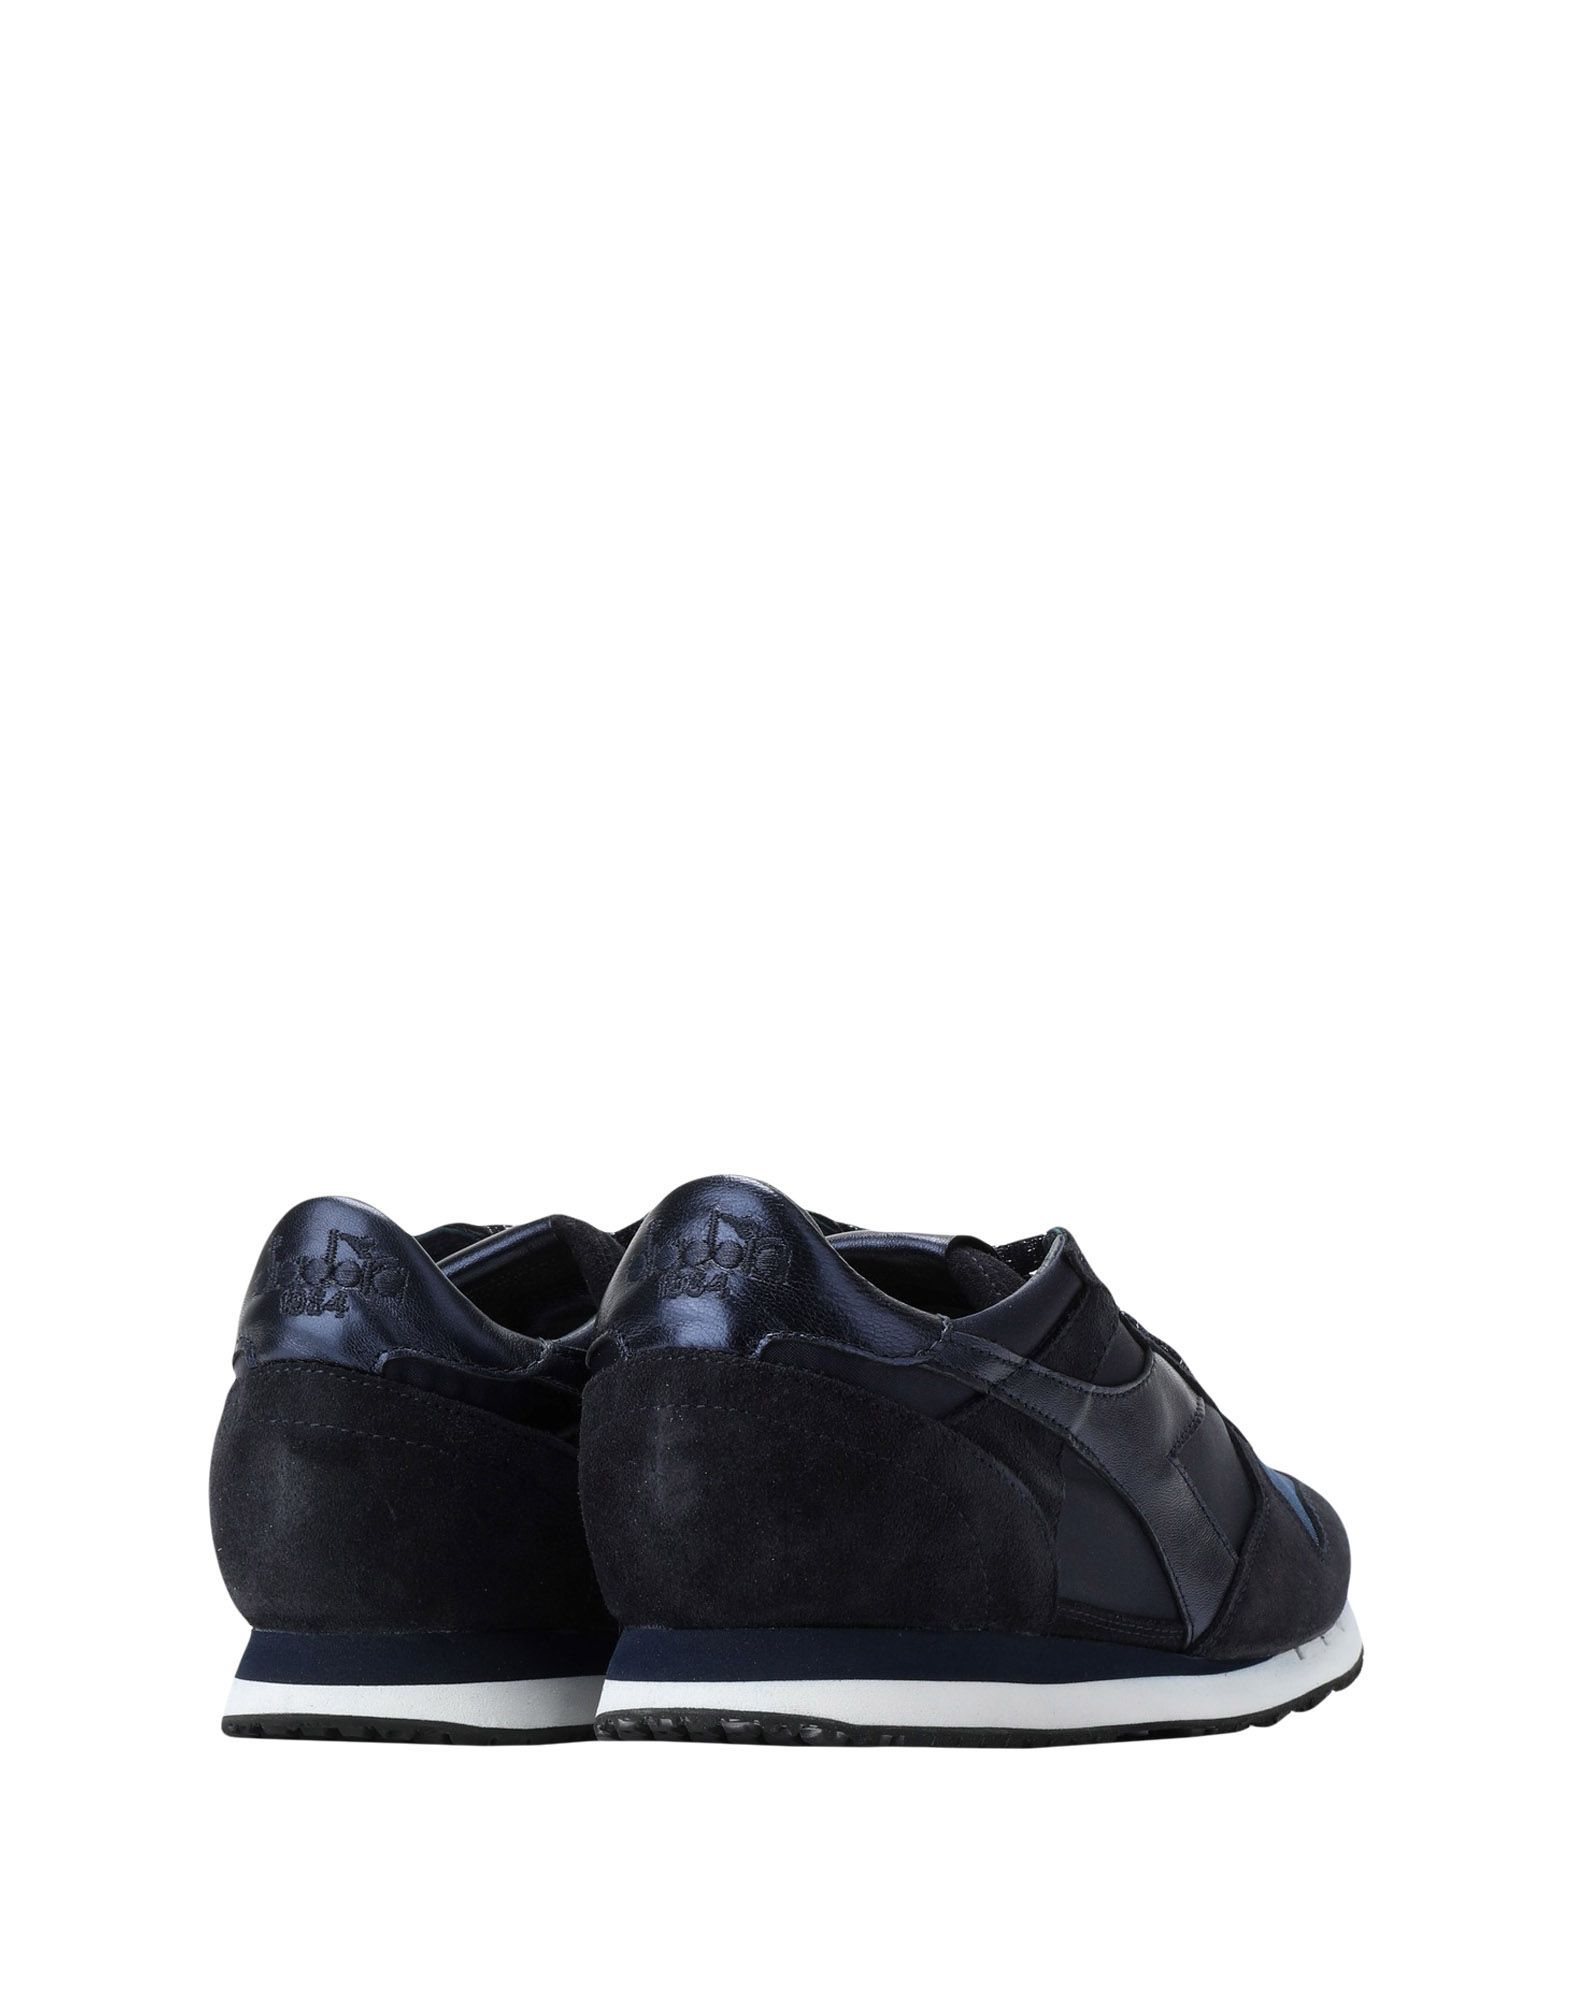 Sneakers Diadora Heritage Trident W Low Satin - Femme - Sneakers Diadora Heritage sur